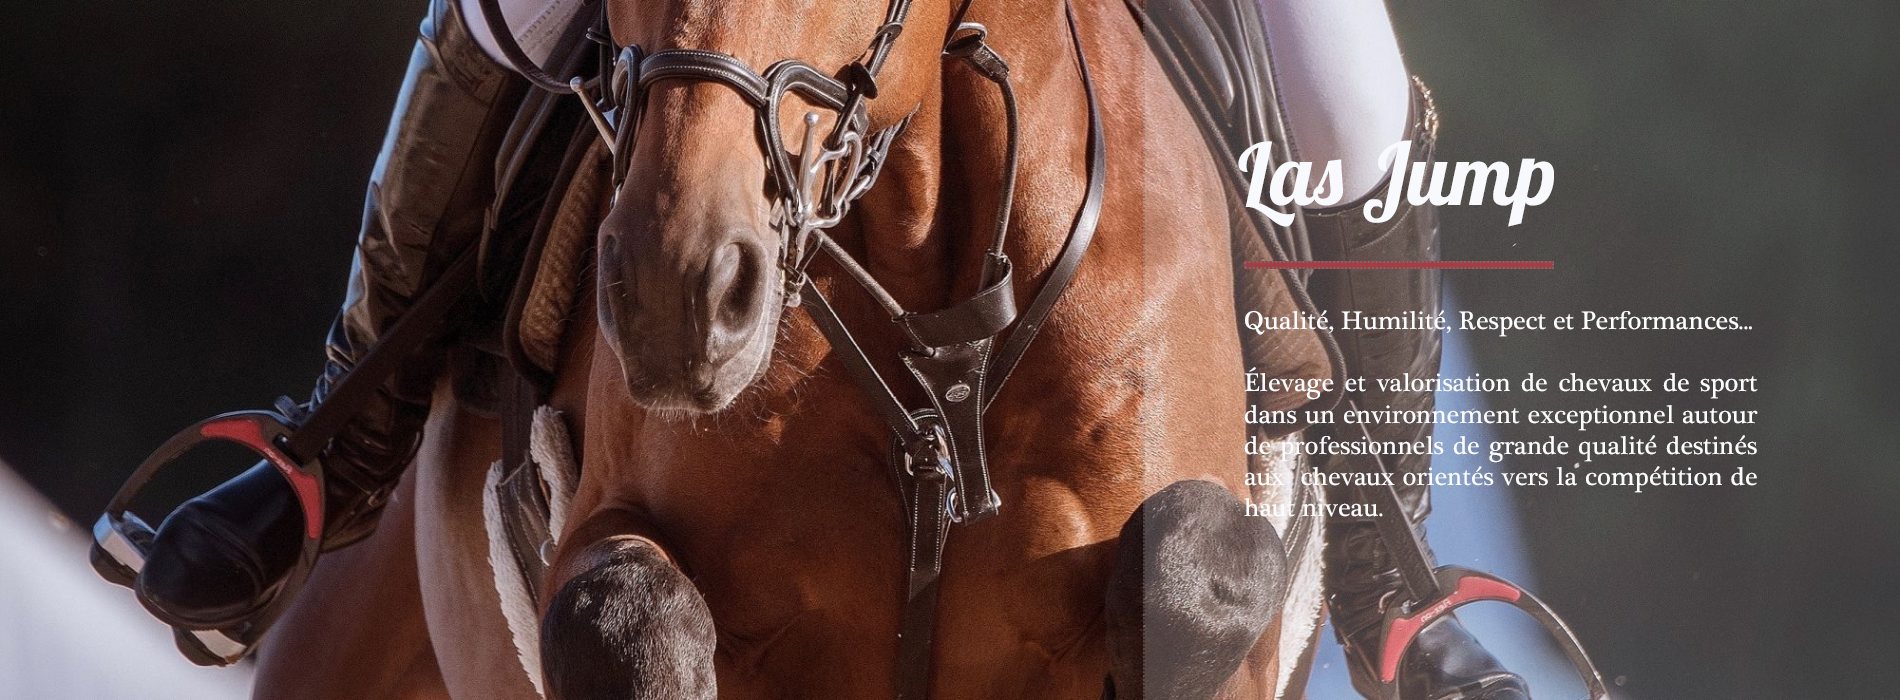 chevaux-sport-las-jump-3